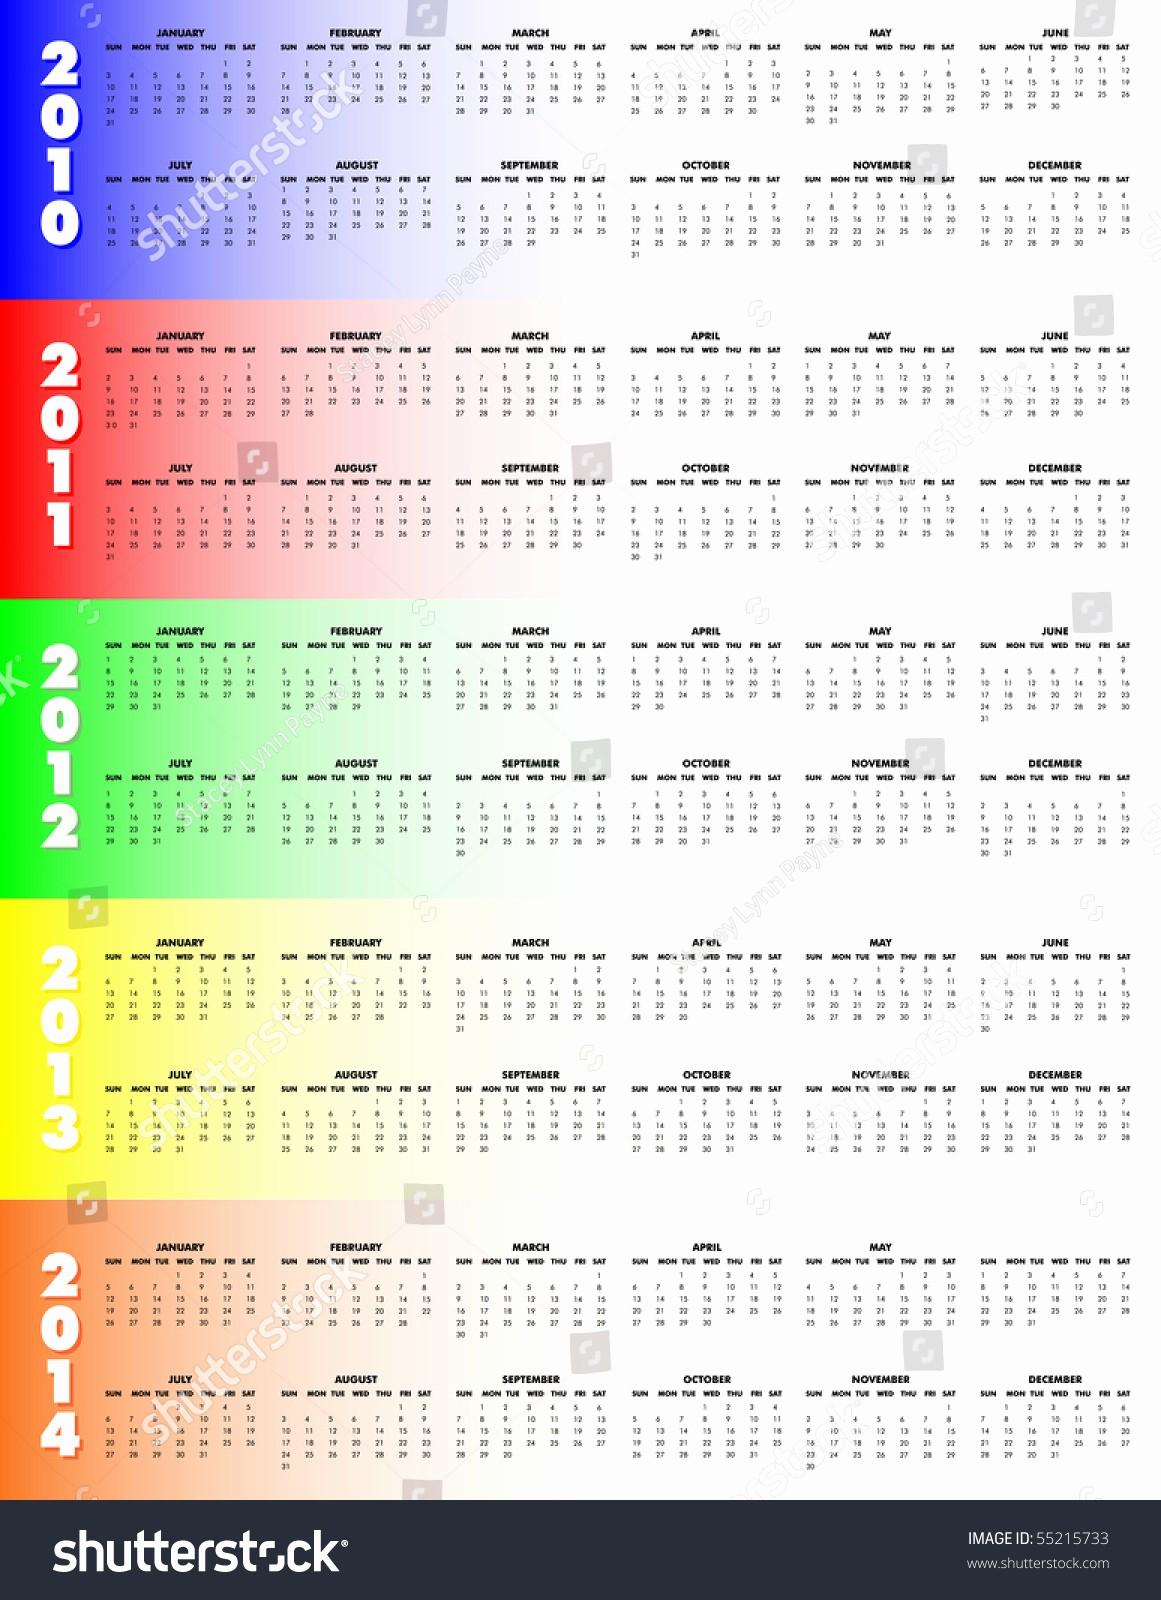 5 Year Calendar Starting 2016 Luxury 5 Year Calendar 2010 Through 2014 Colorful Background